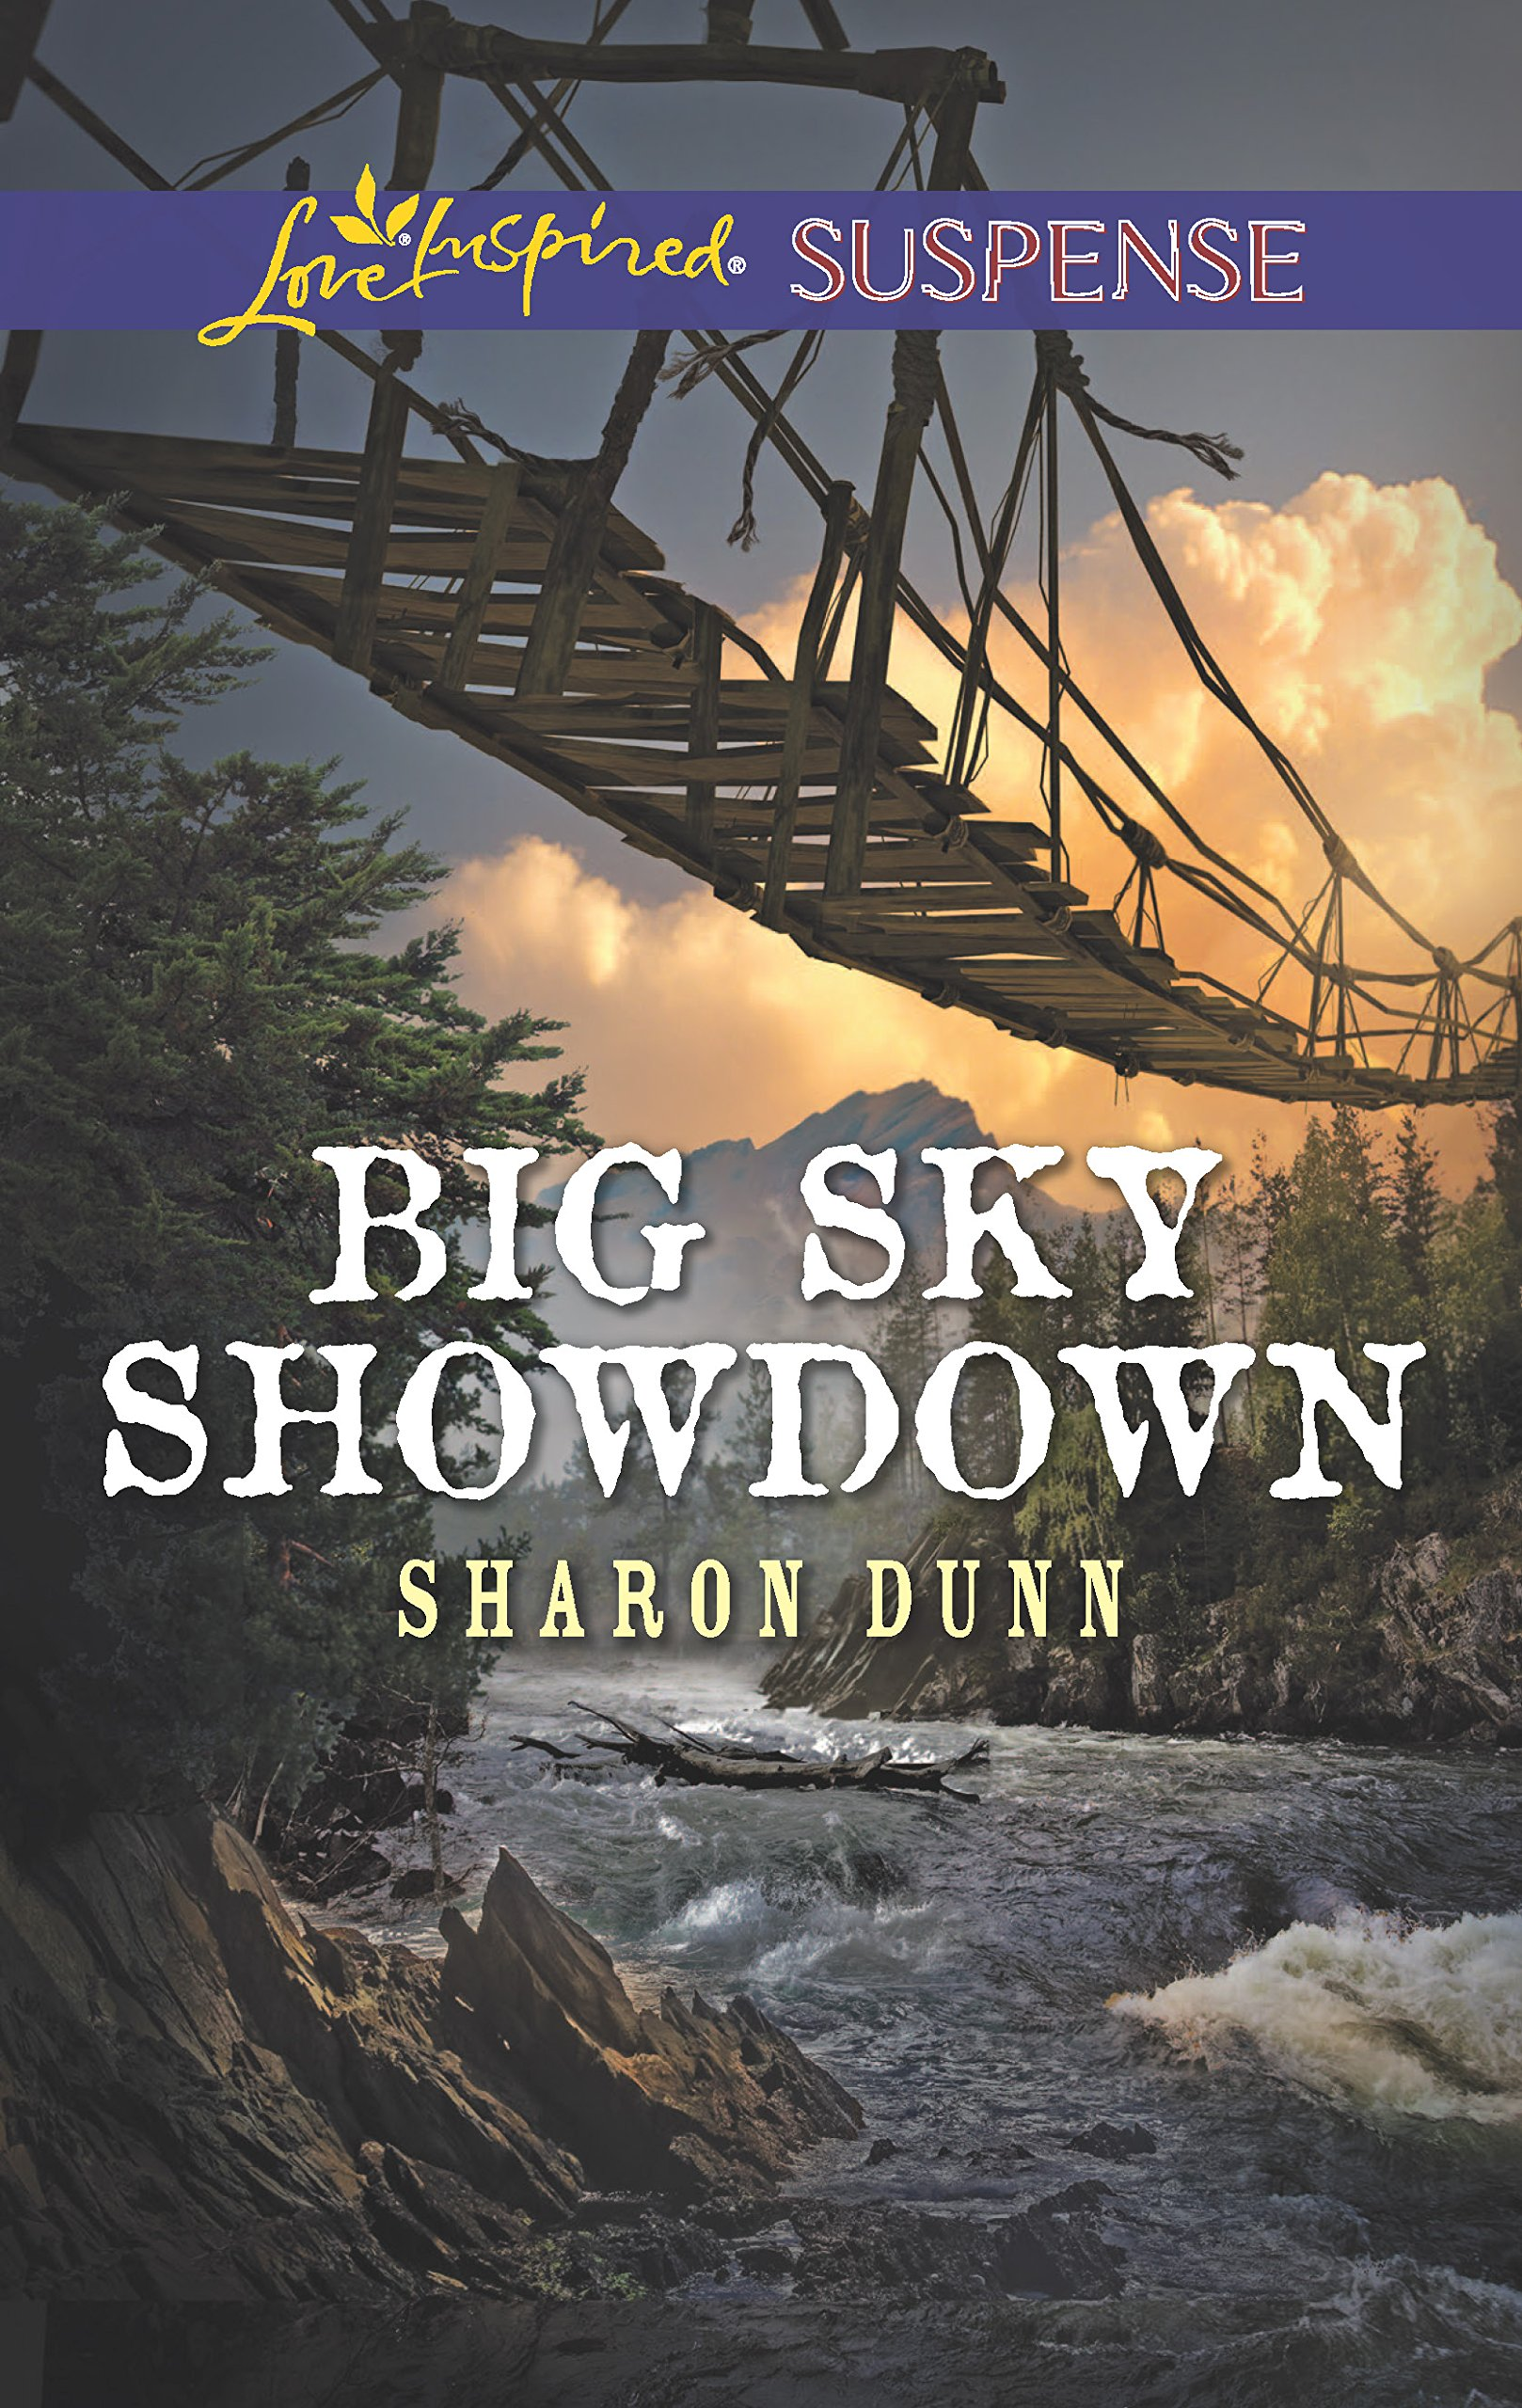 Download Big Sky Showdown (Love Inspired Suspense) ebook